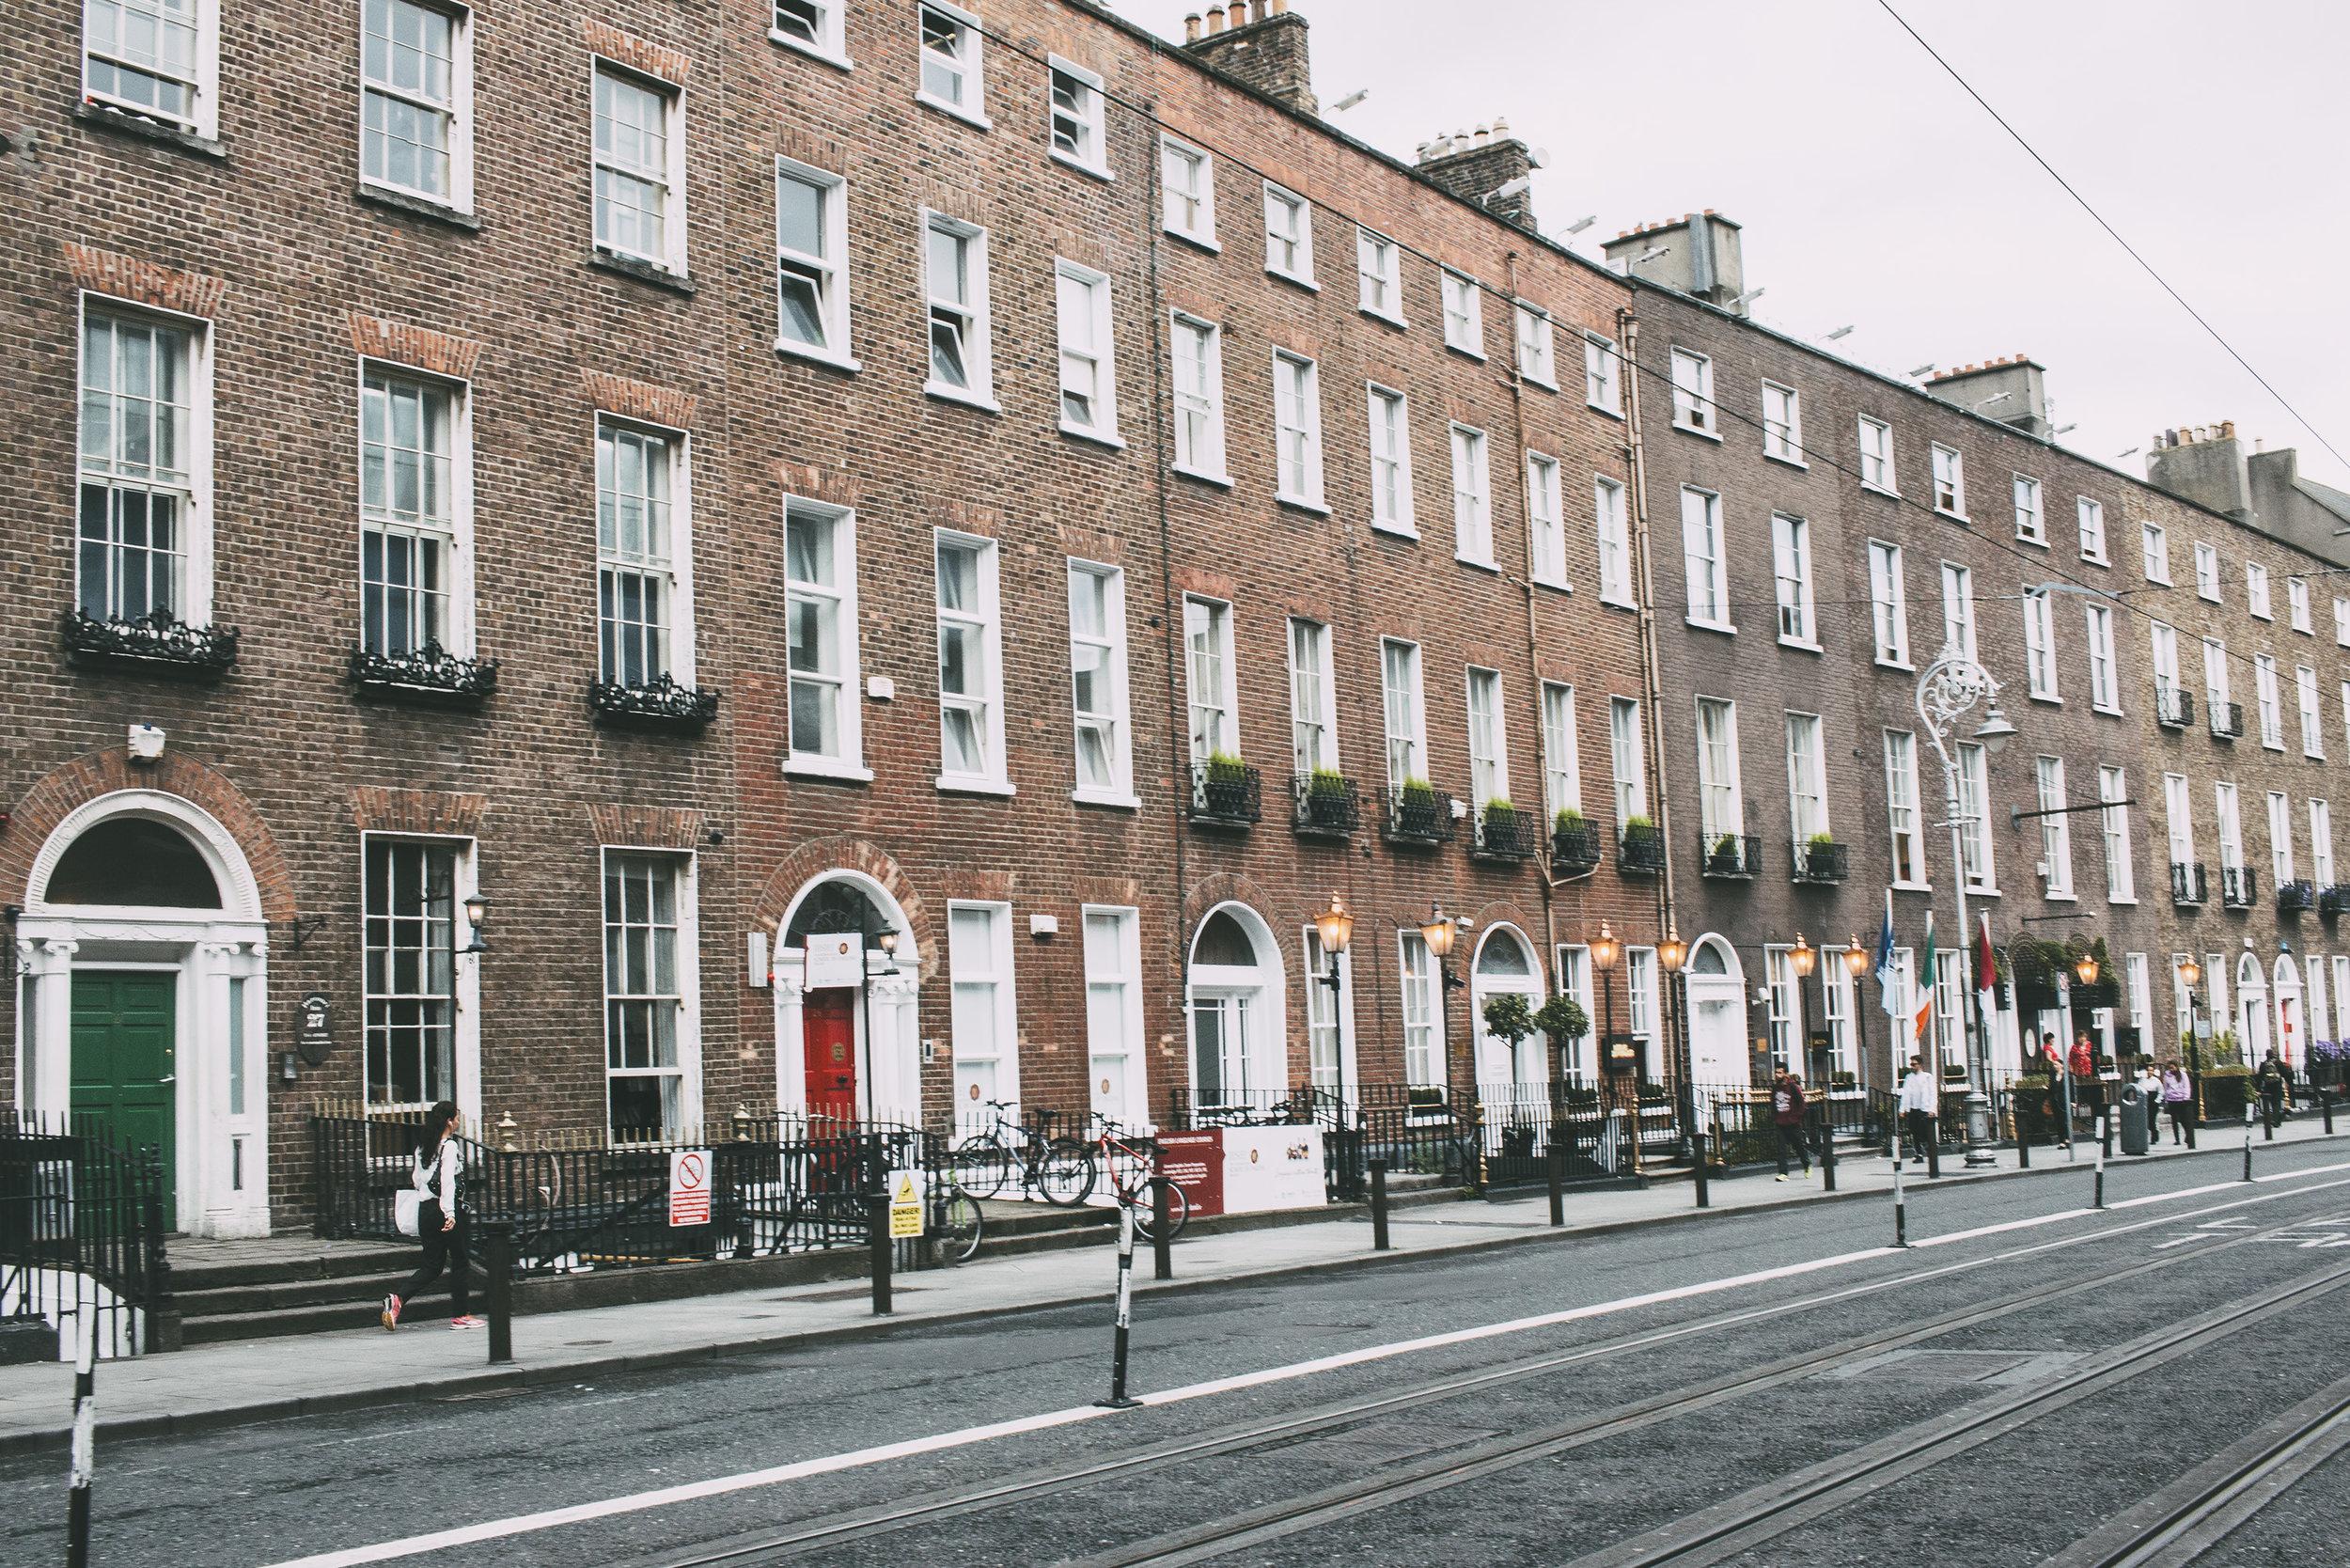 Dublin_07262016_07_1.jpg